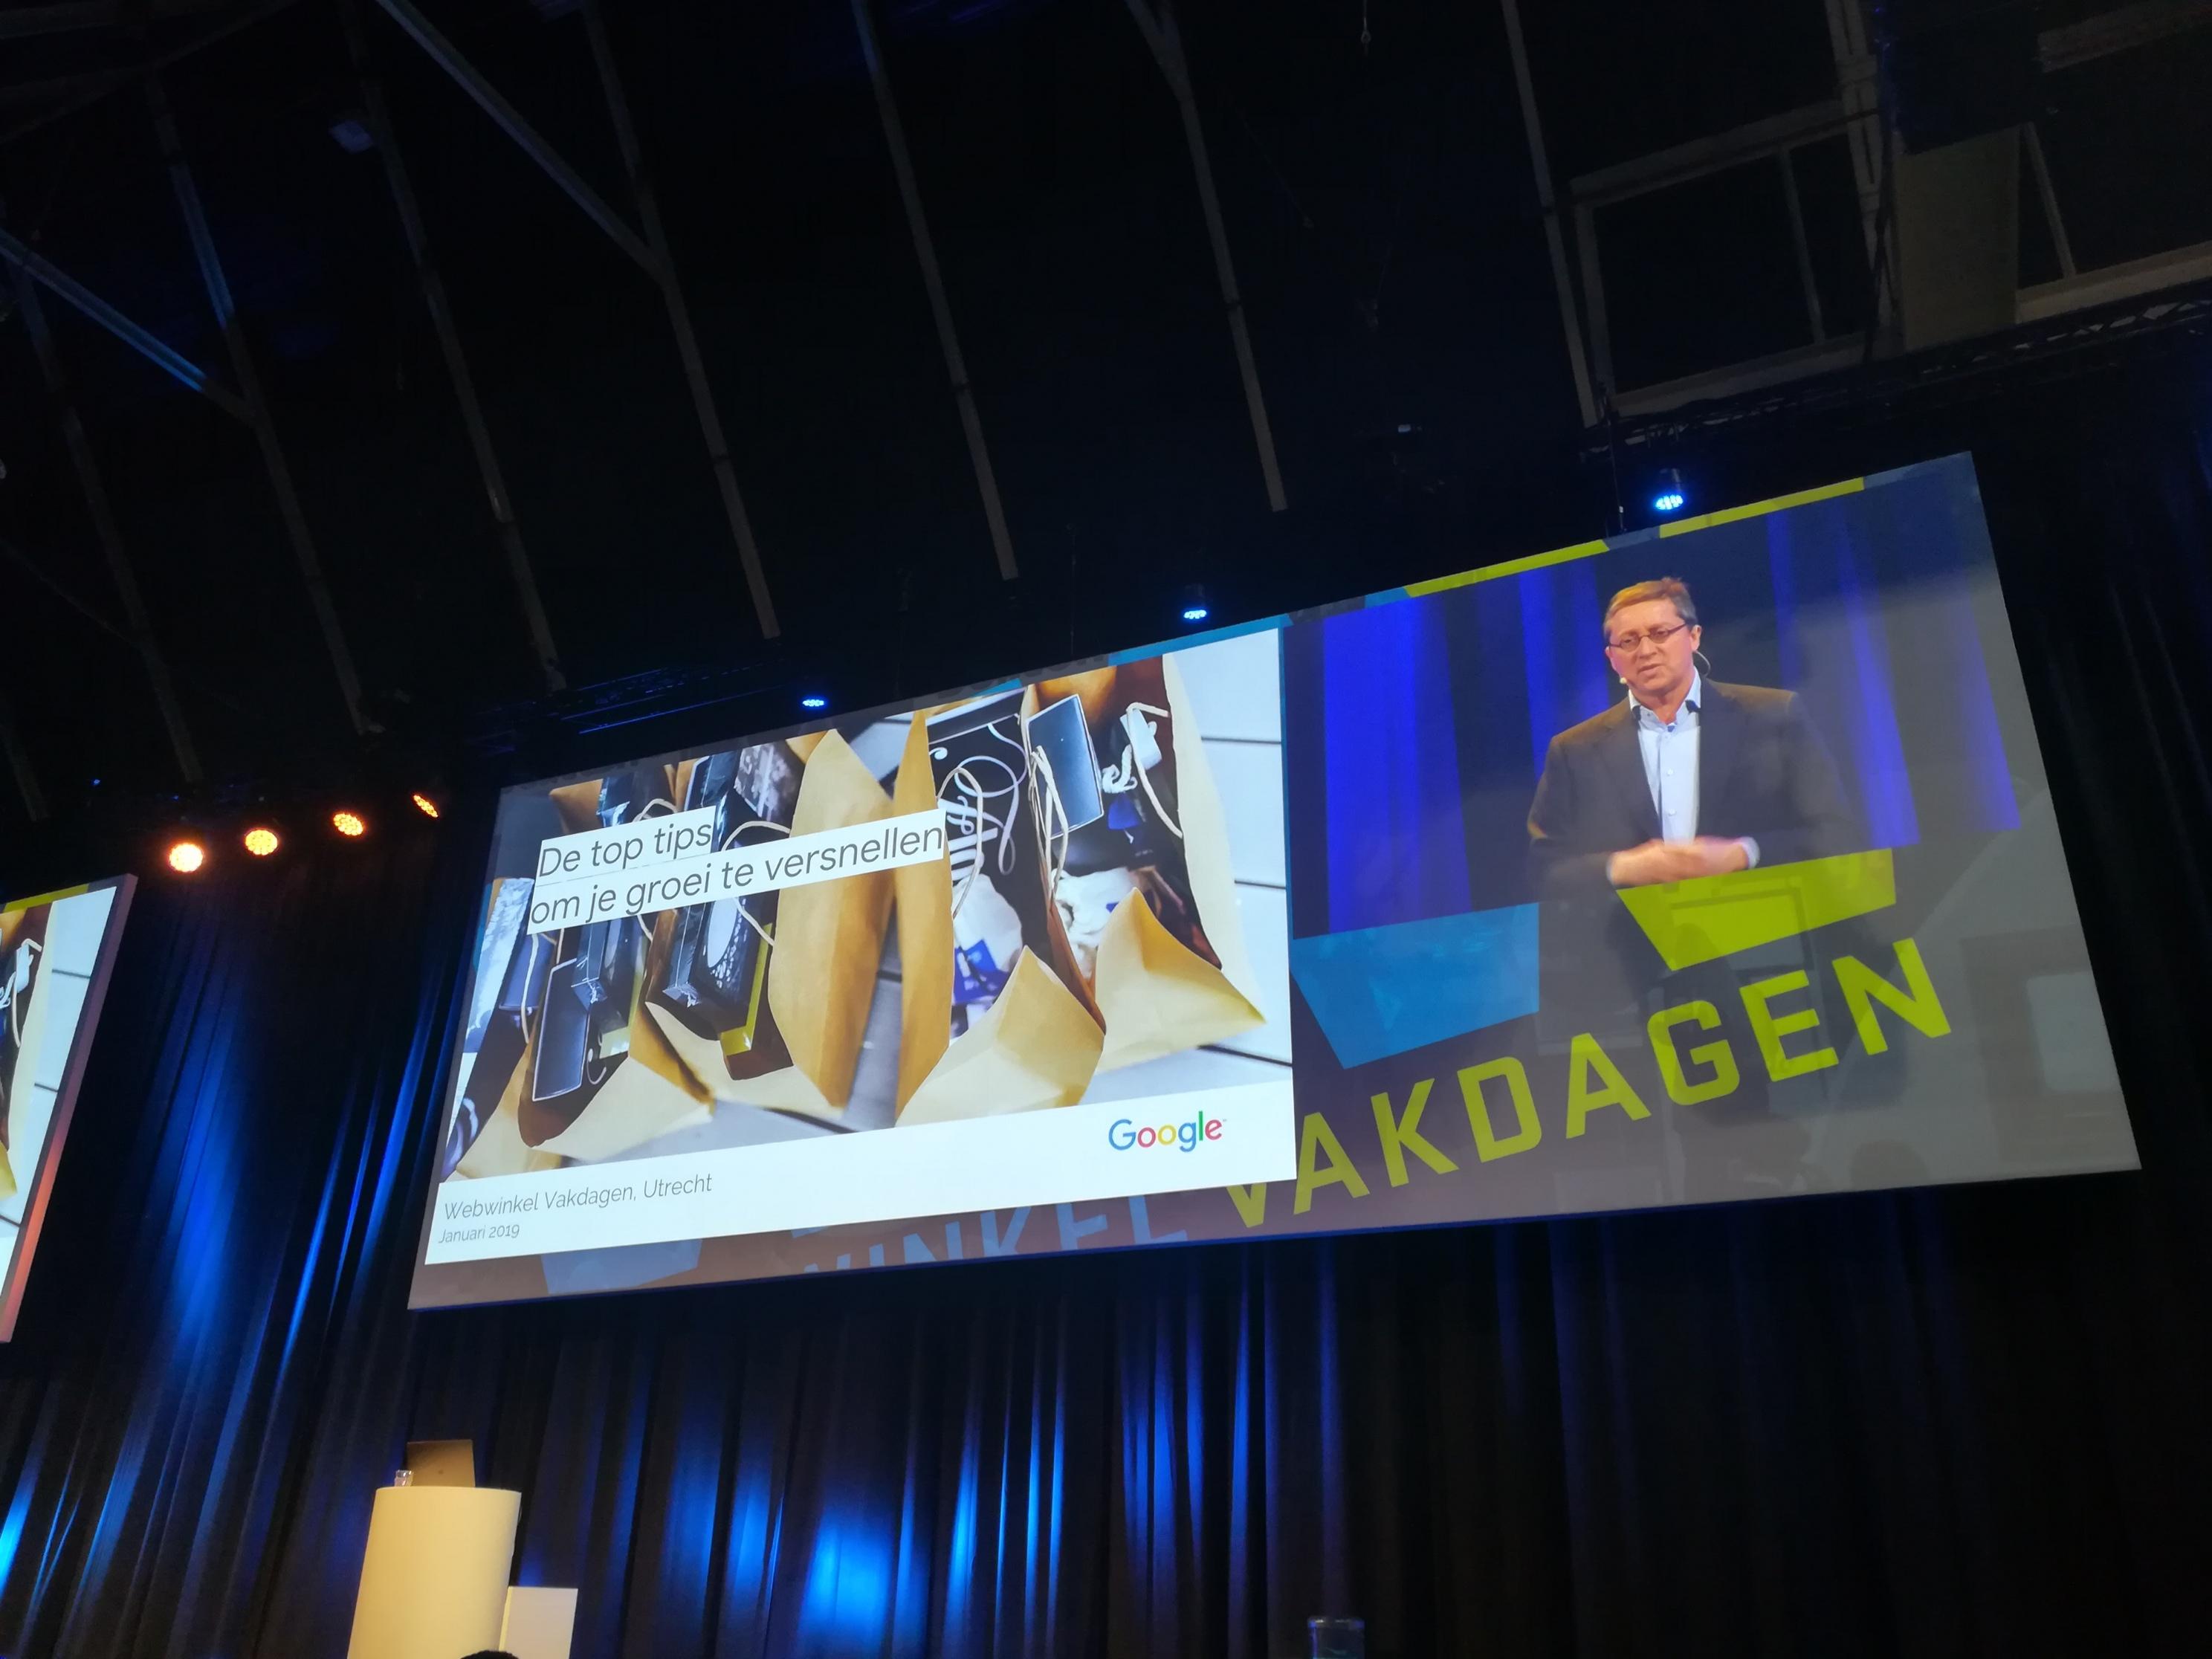 Webwinkel Vakdagen - Keynote Google